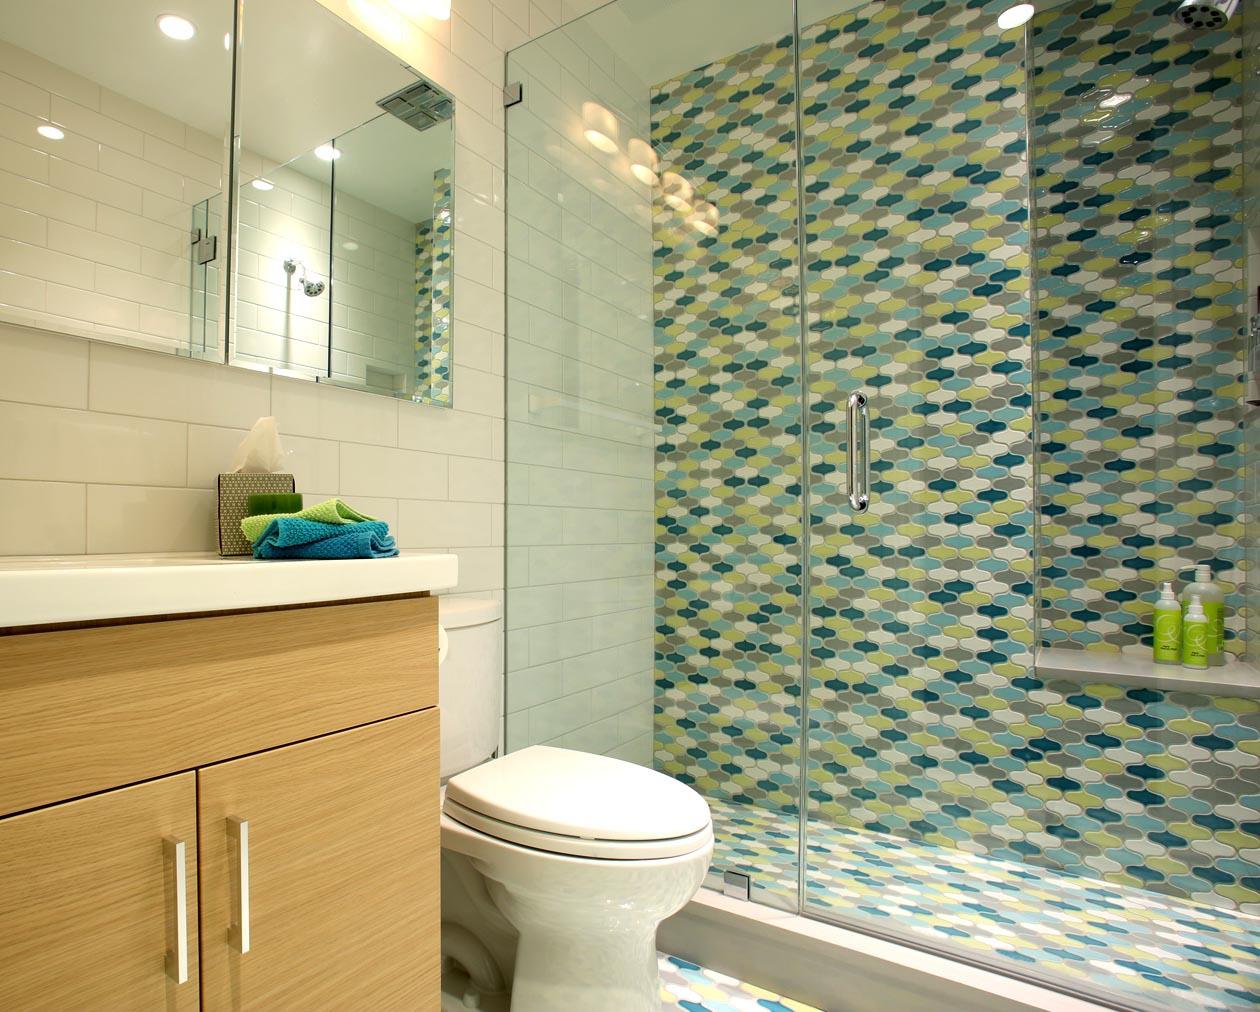 Transitional Design - BAUHAUS INSPIRED TILED BATHROOM